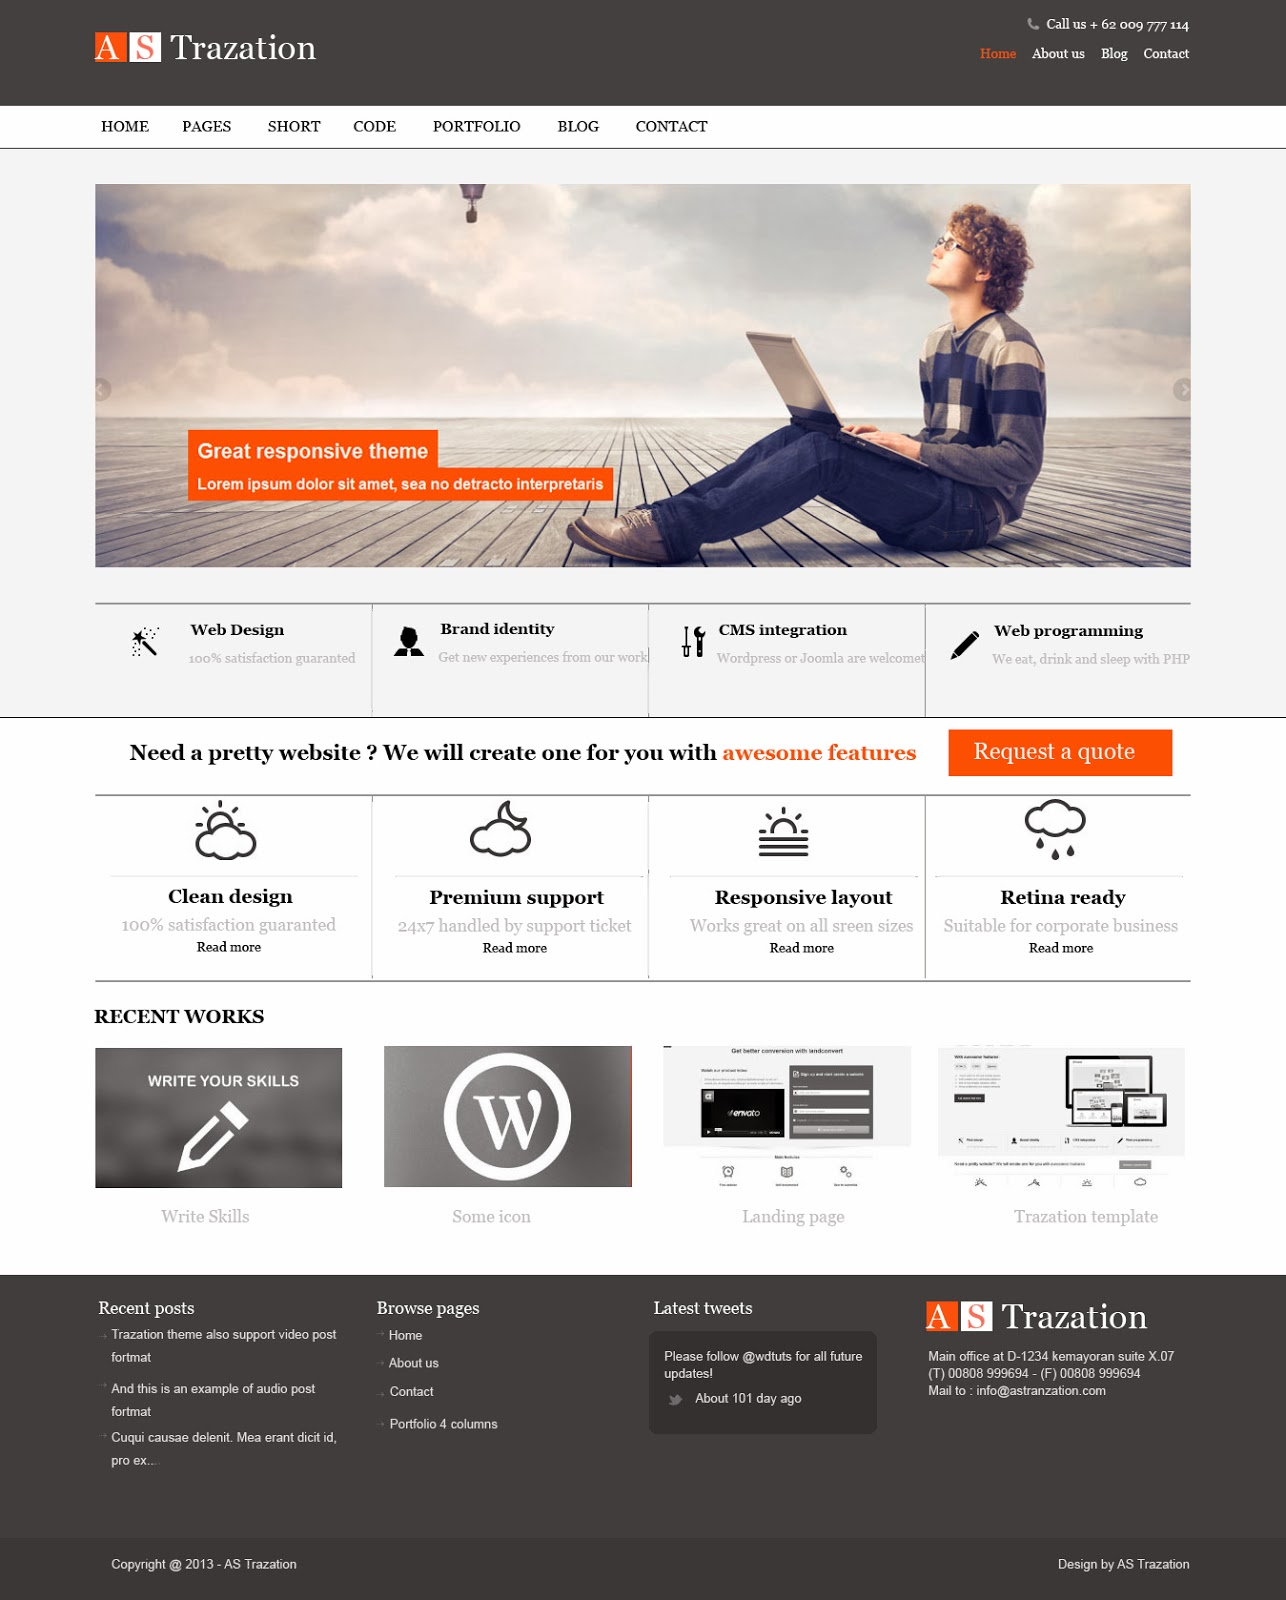 Best Graphic Design Website Templates: Web Designer Portfolio: AS Trazation Clean Design Template